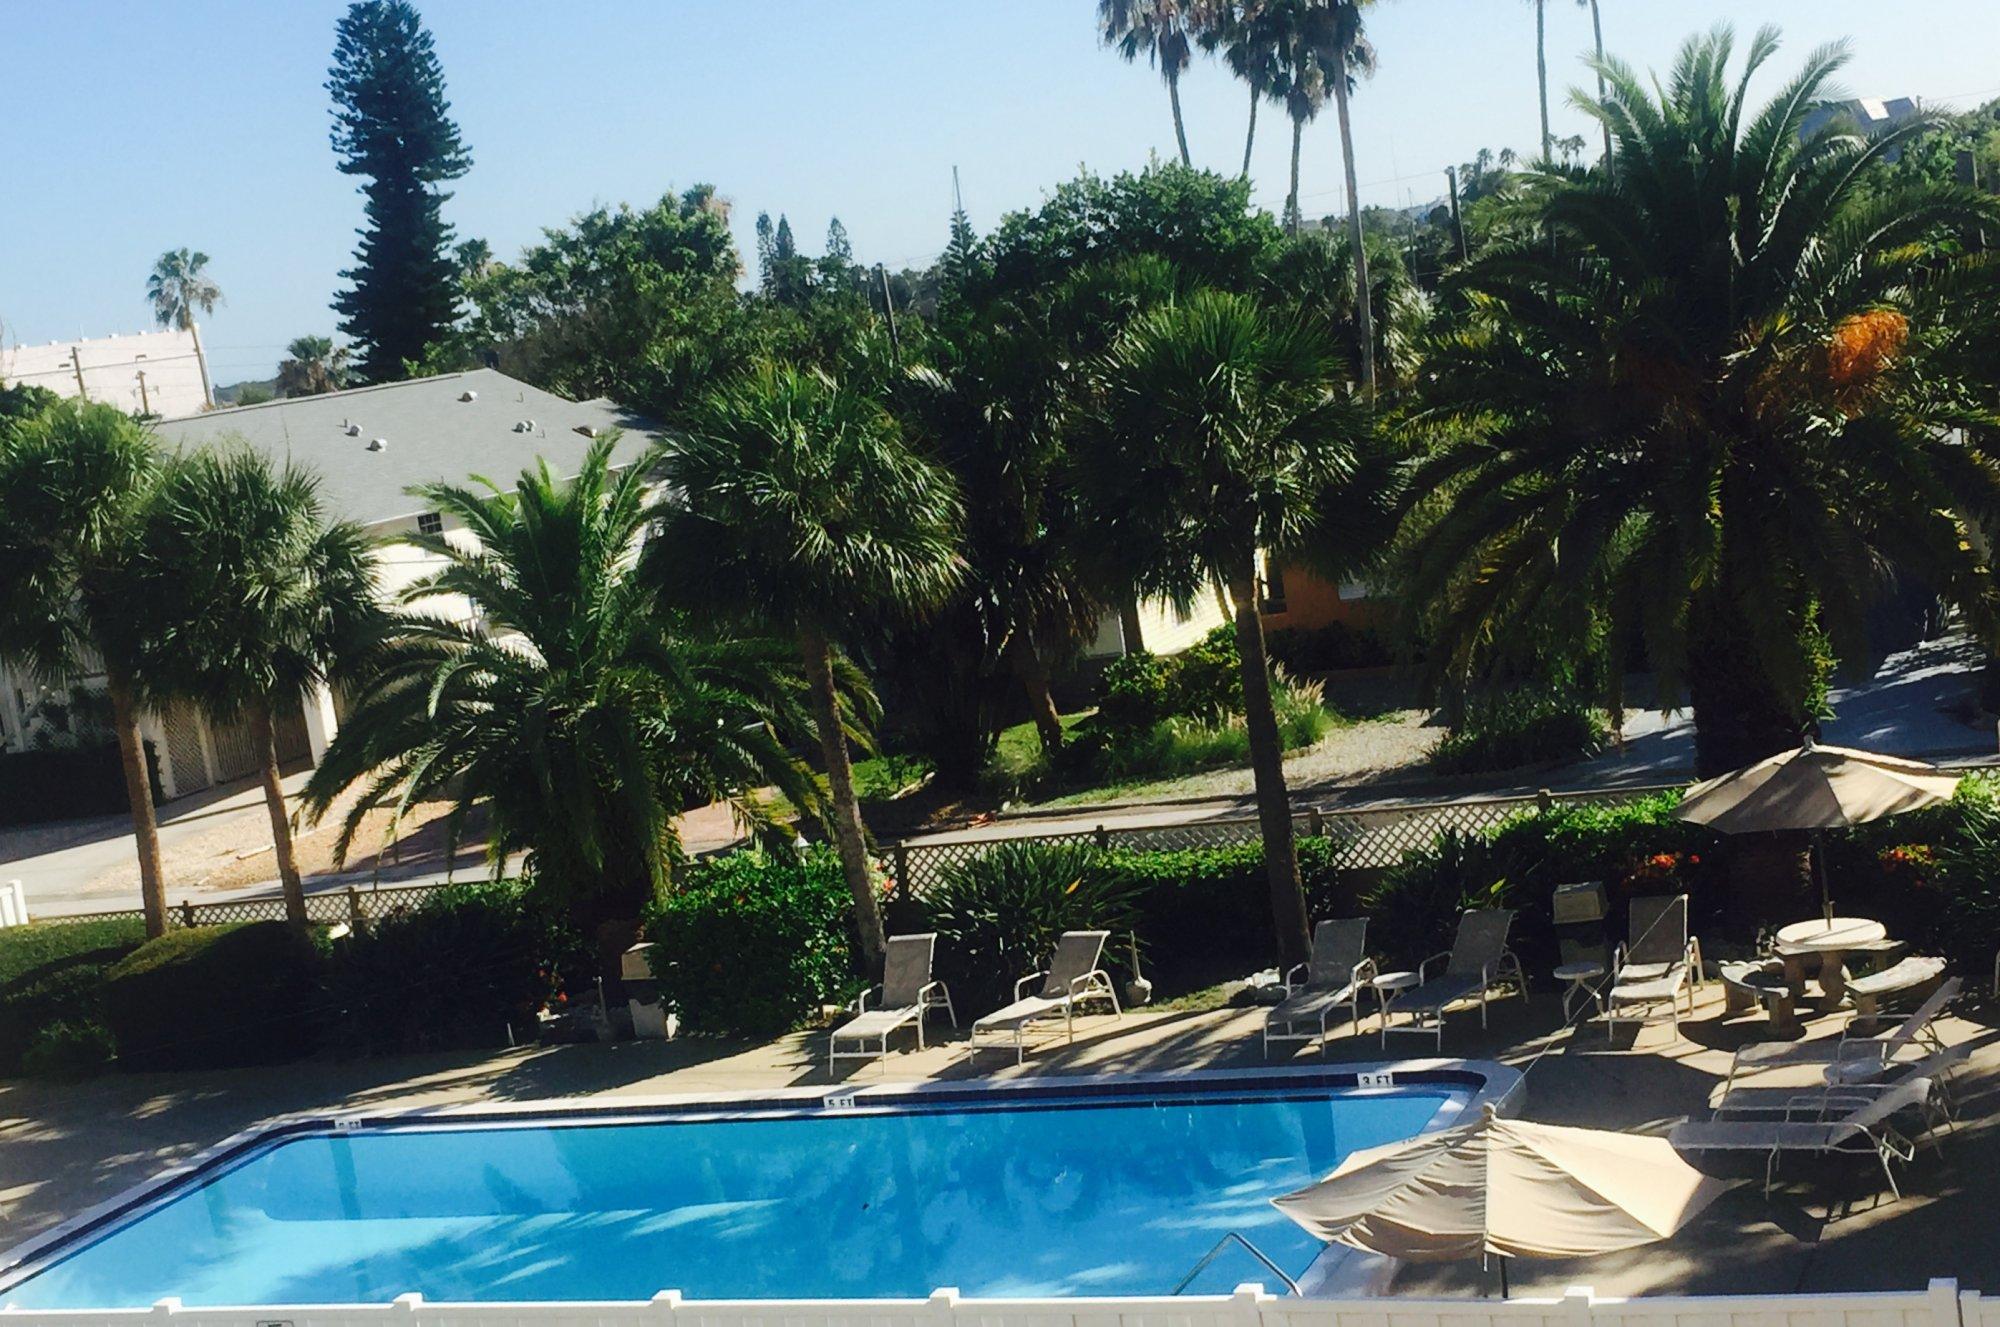 Gulf View Condo Vacation Rentals In Florida Carter